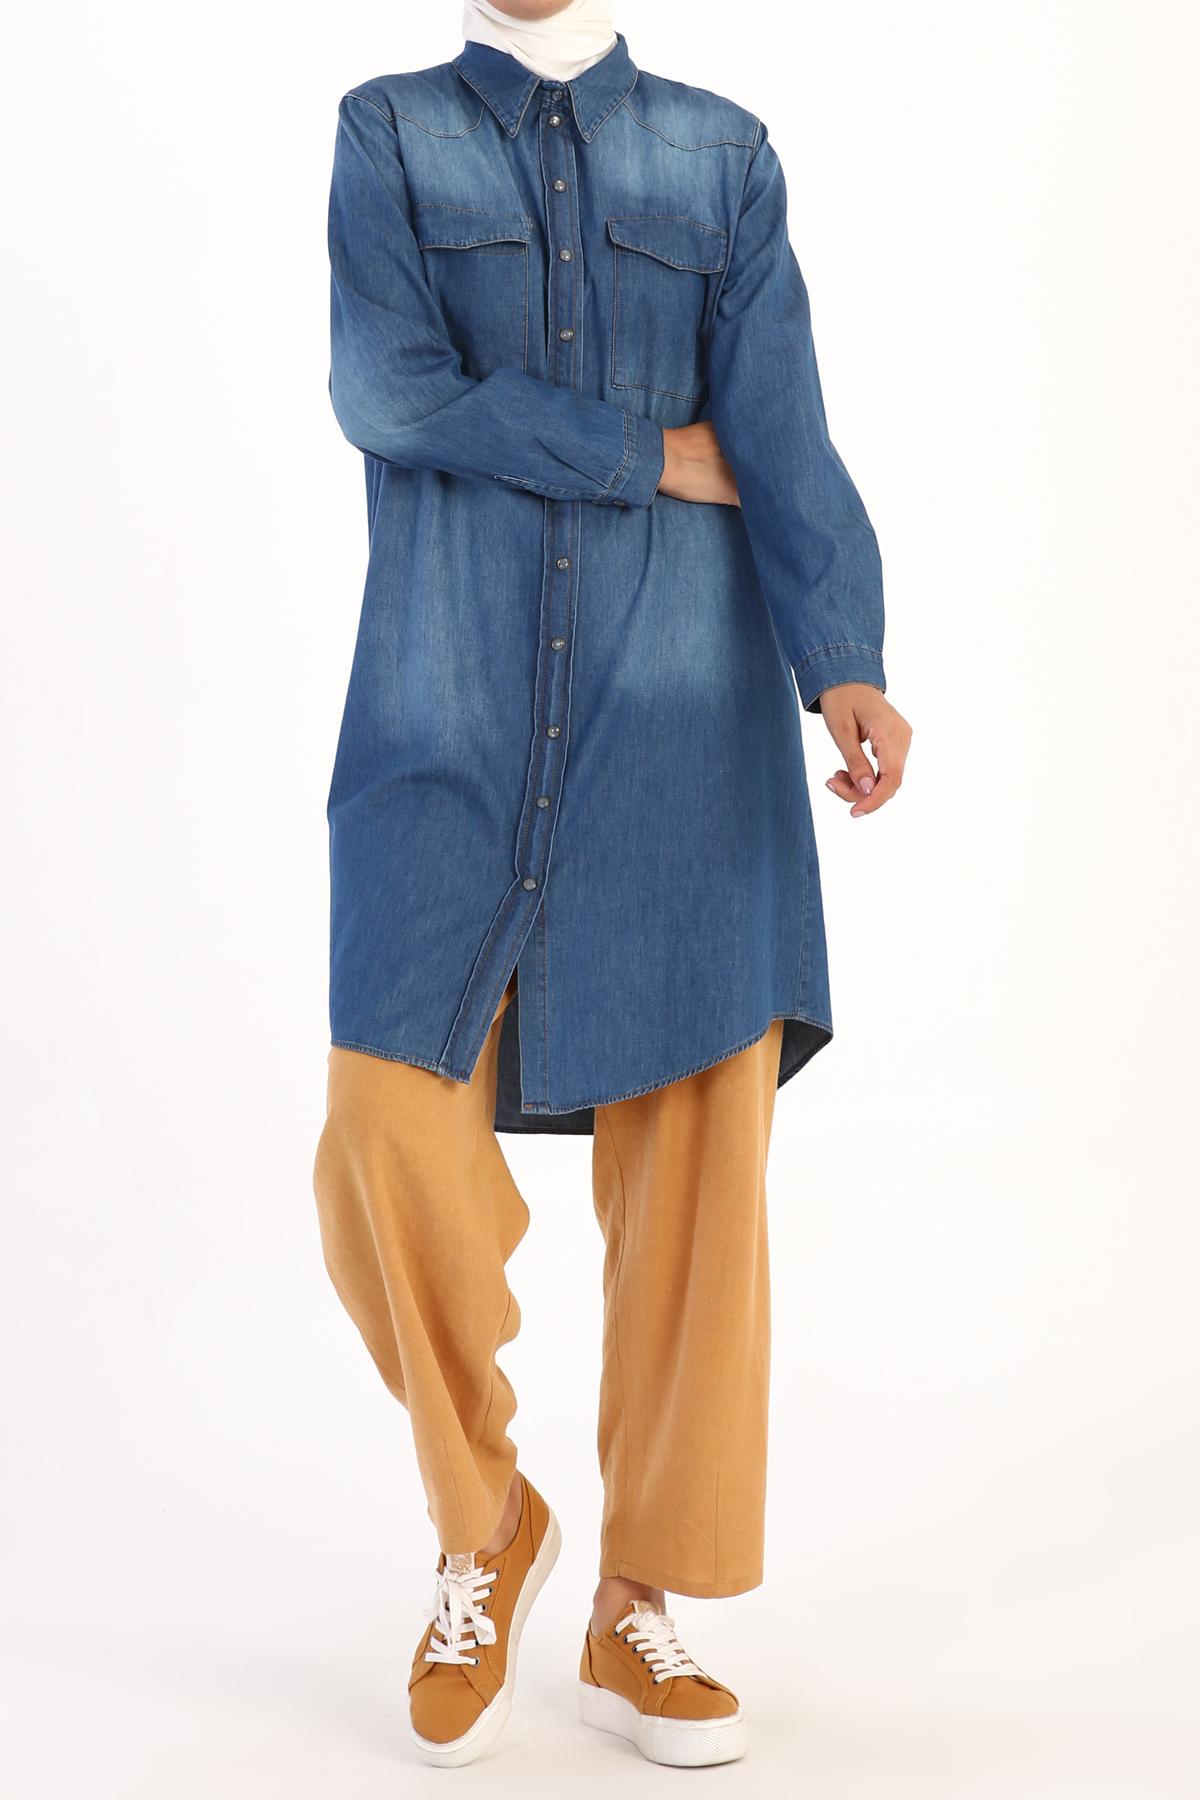 Pocket Detailed Cotton Long Jean Shirt